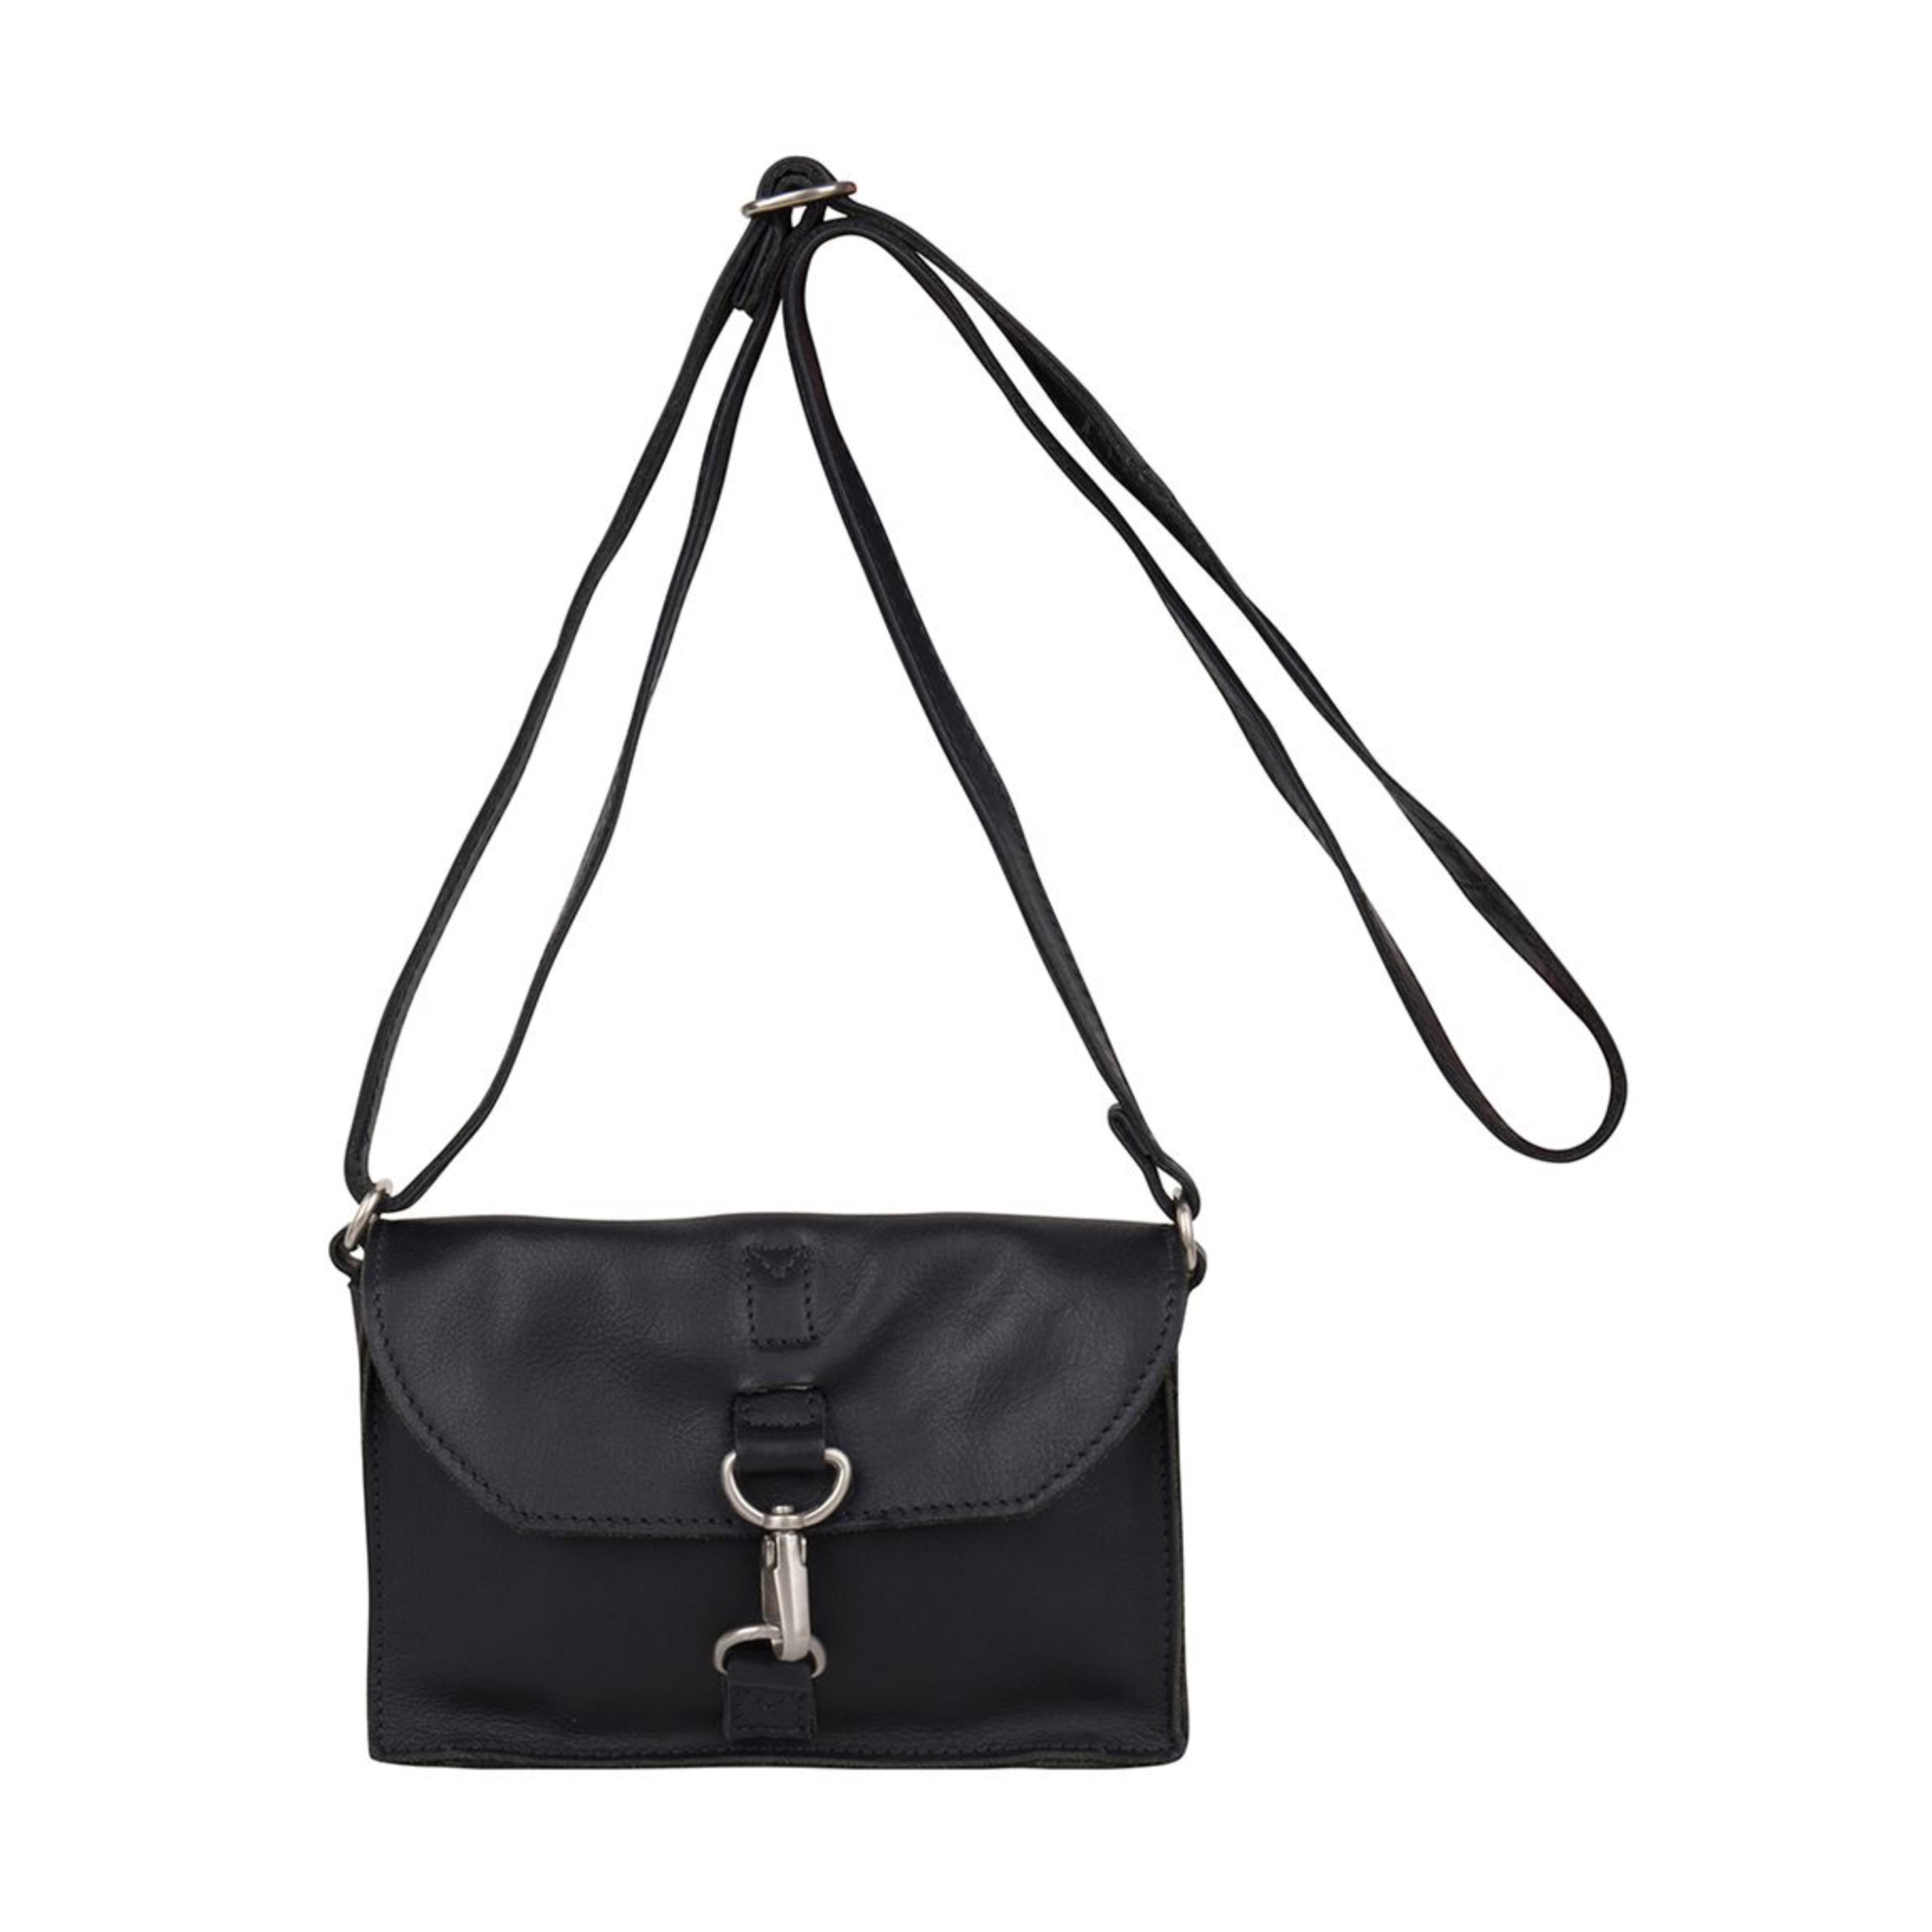 8900c217cd531 COWBOYSBAG Damen Tasche Umhängetasche Bag Harlem Black 2012 Damen ...